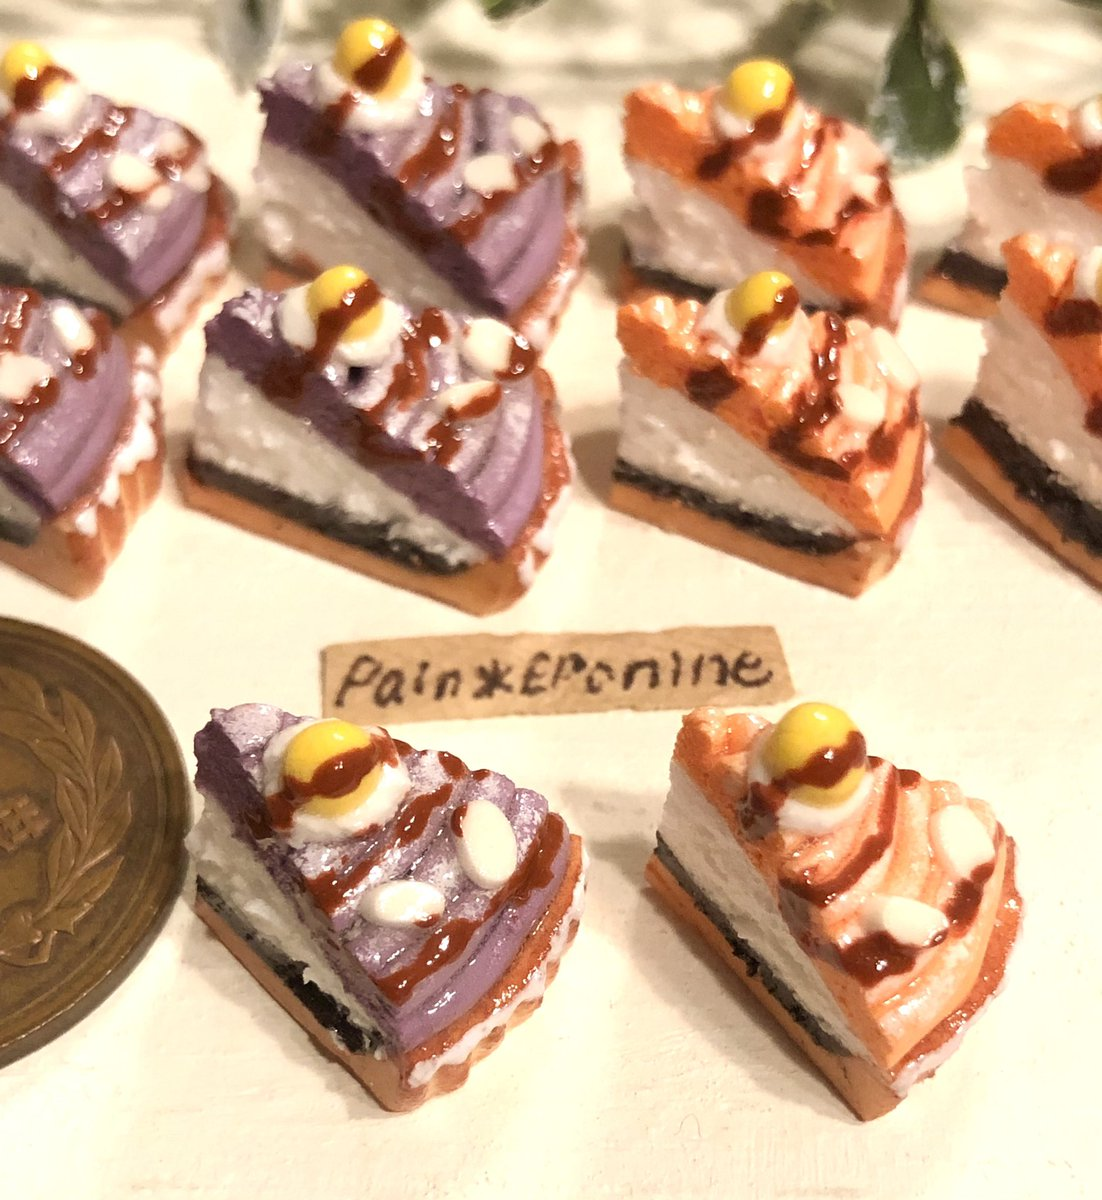 test ツイッターメディア - 【ミニチュア】紫芋とカボチャのモンブランタルト  焼き色にこだわったタルトに、チョコレート生地、ホイップ、紫芋とカボチャのクリームを飾りました🍠🎃  シルバニアやリカちゃんなどお人形遊びにも✨  #ハンドメイド #ドールハウス #モンブラン #タルト #ケーキ #minne  https://t.co/h7zsSOvlPH https://t.co/1F3zOMUhcy